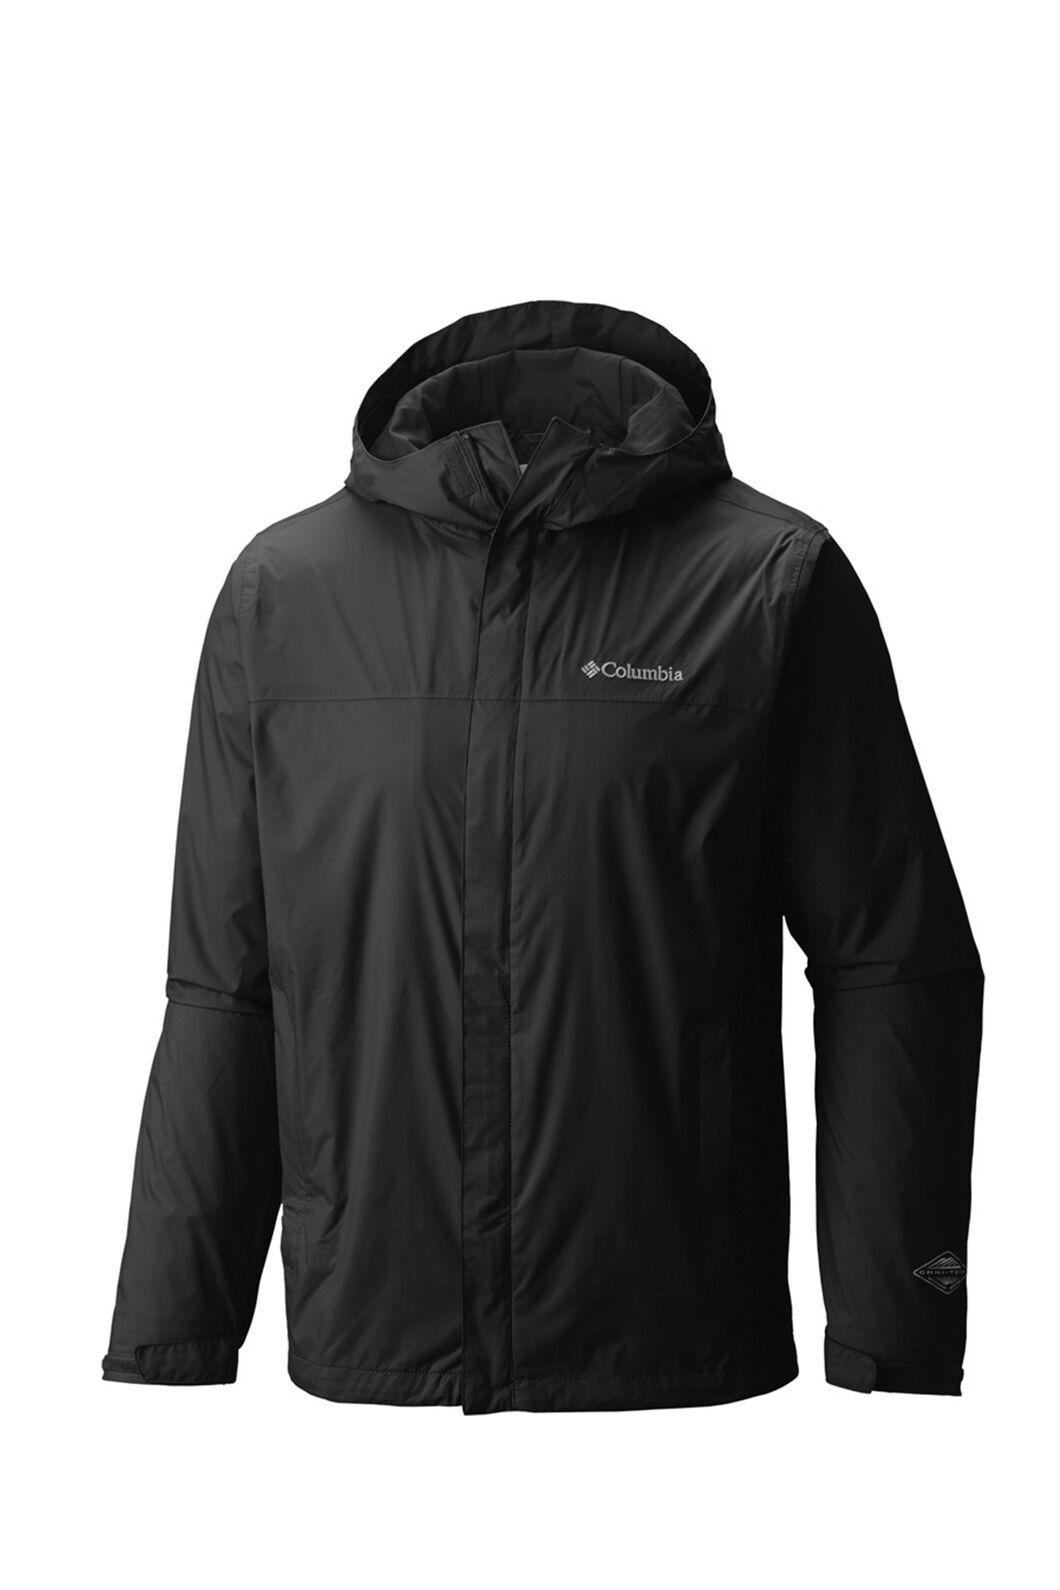 Columbia Men's Watertight II Jacket, Black, hi-res